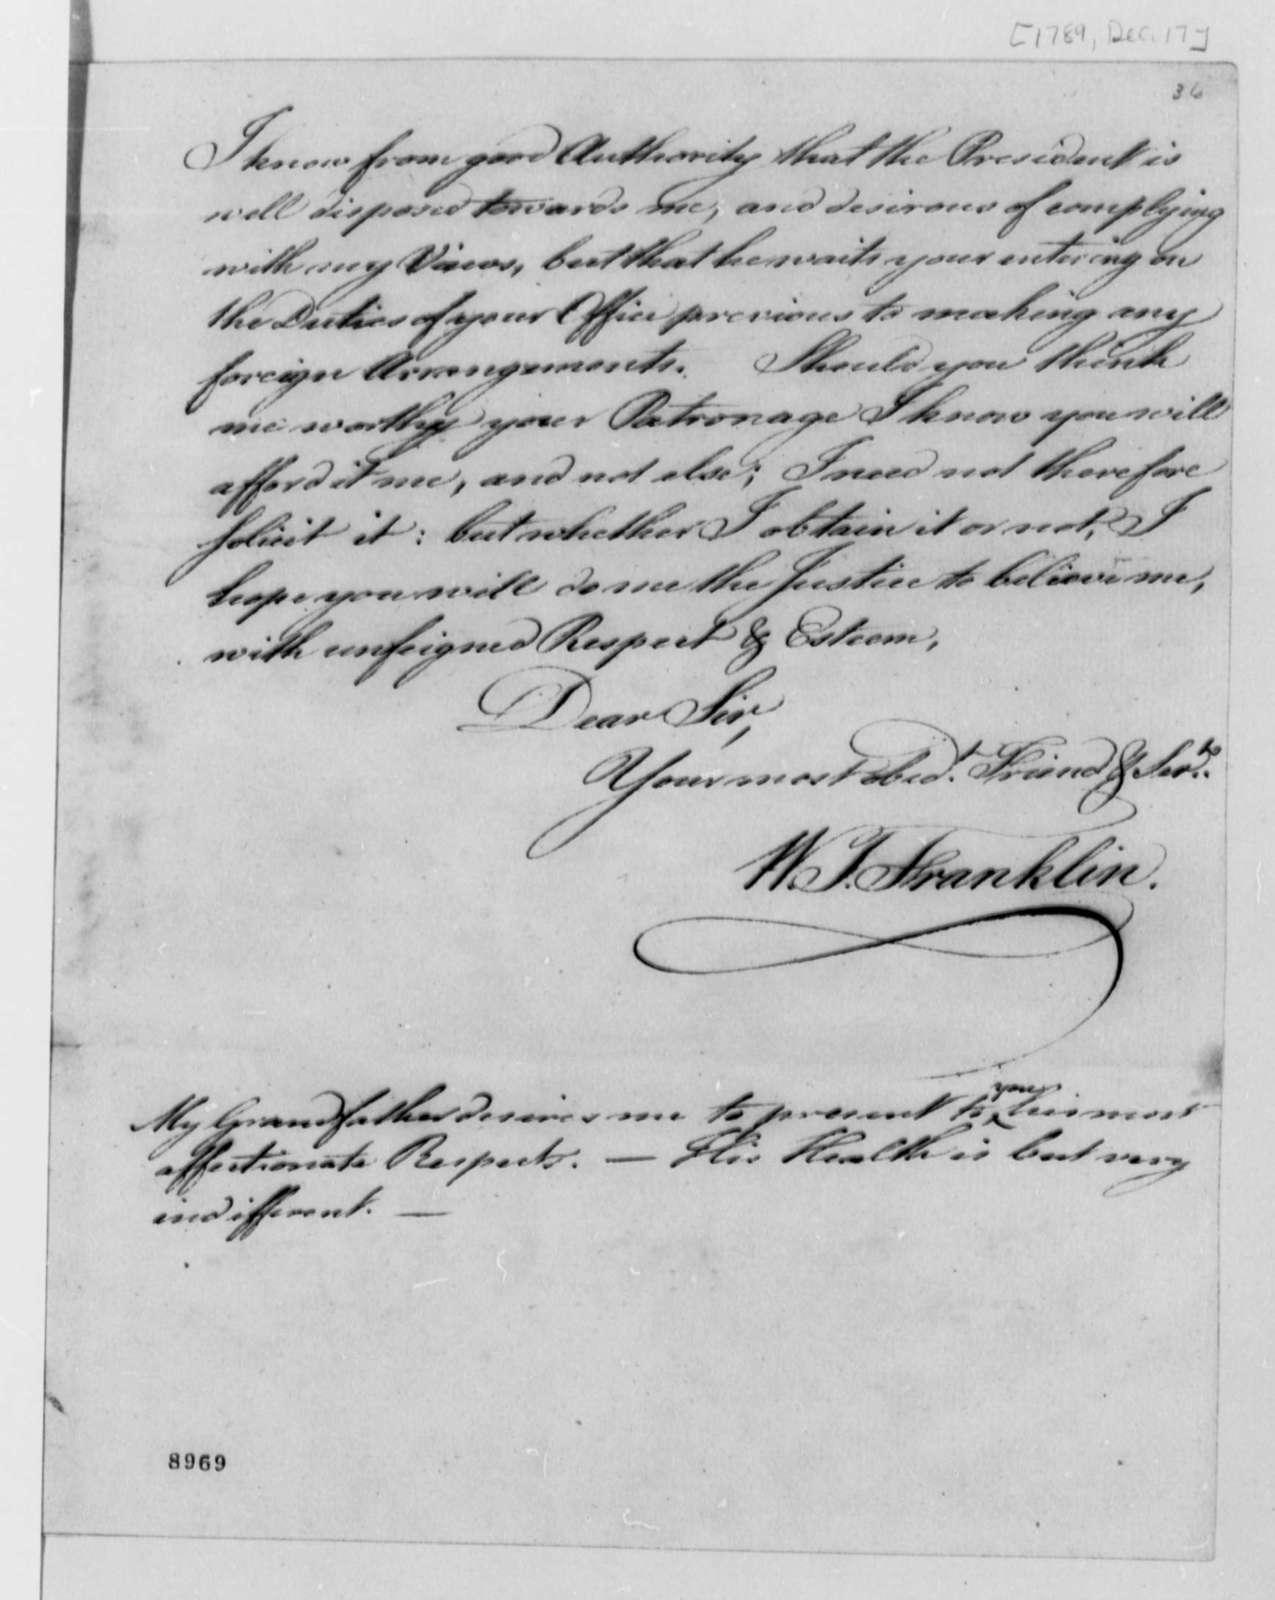 William Temple Franklin to Thomas Jefferson, December 17, 1789